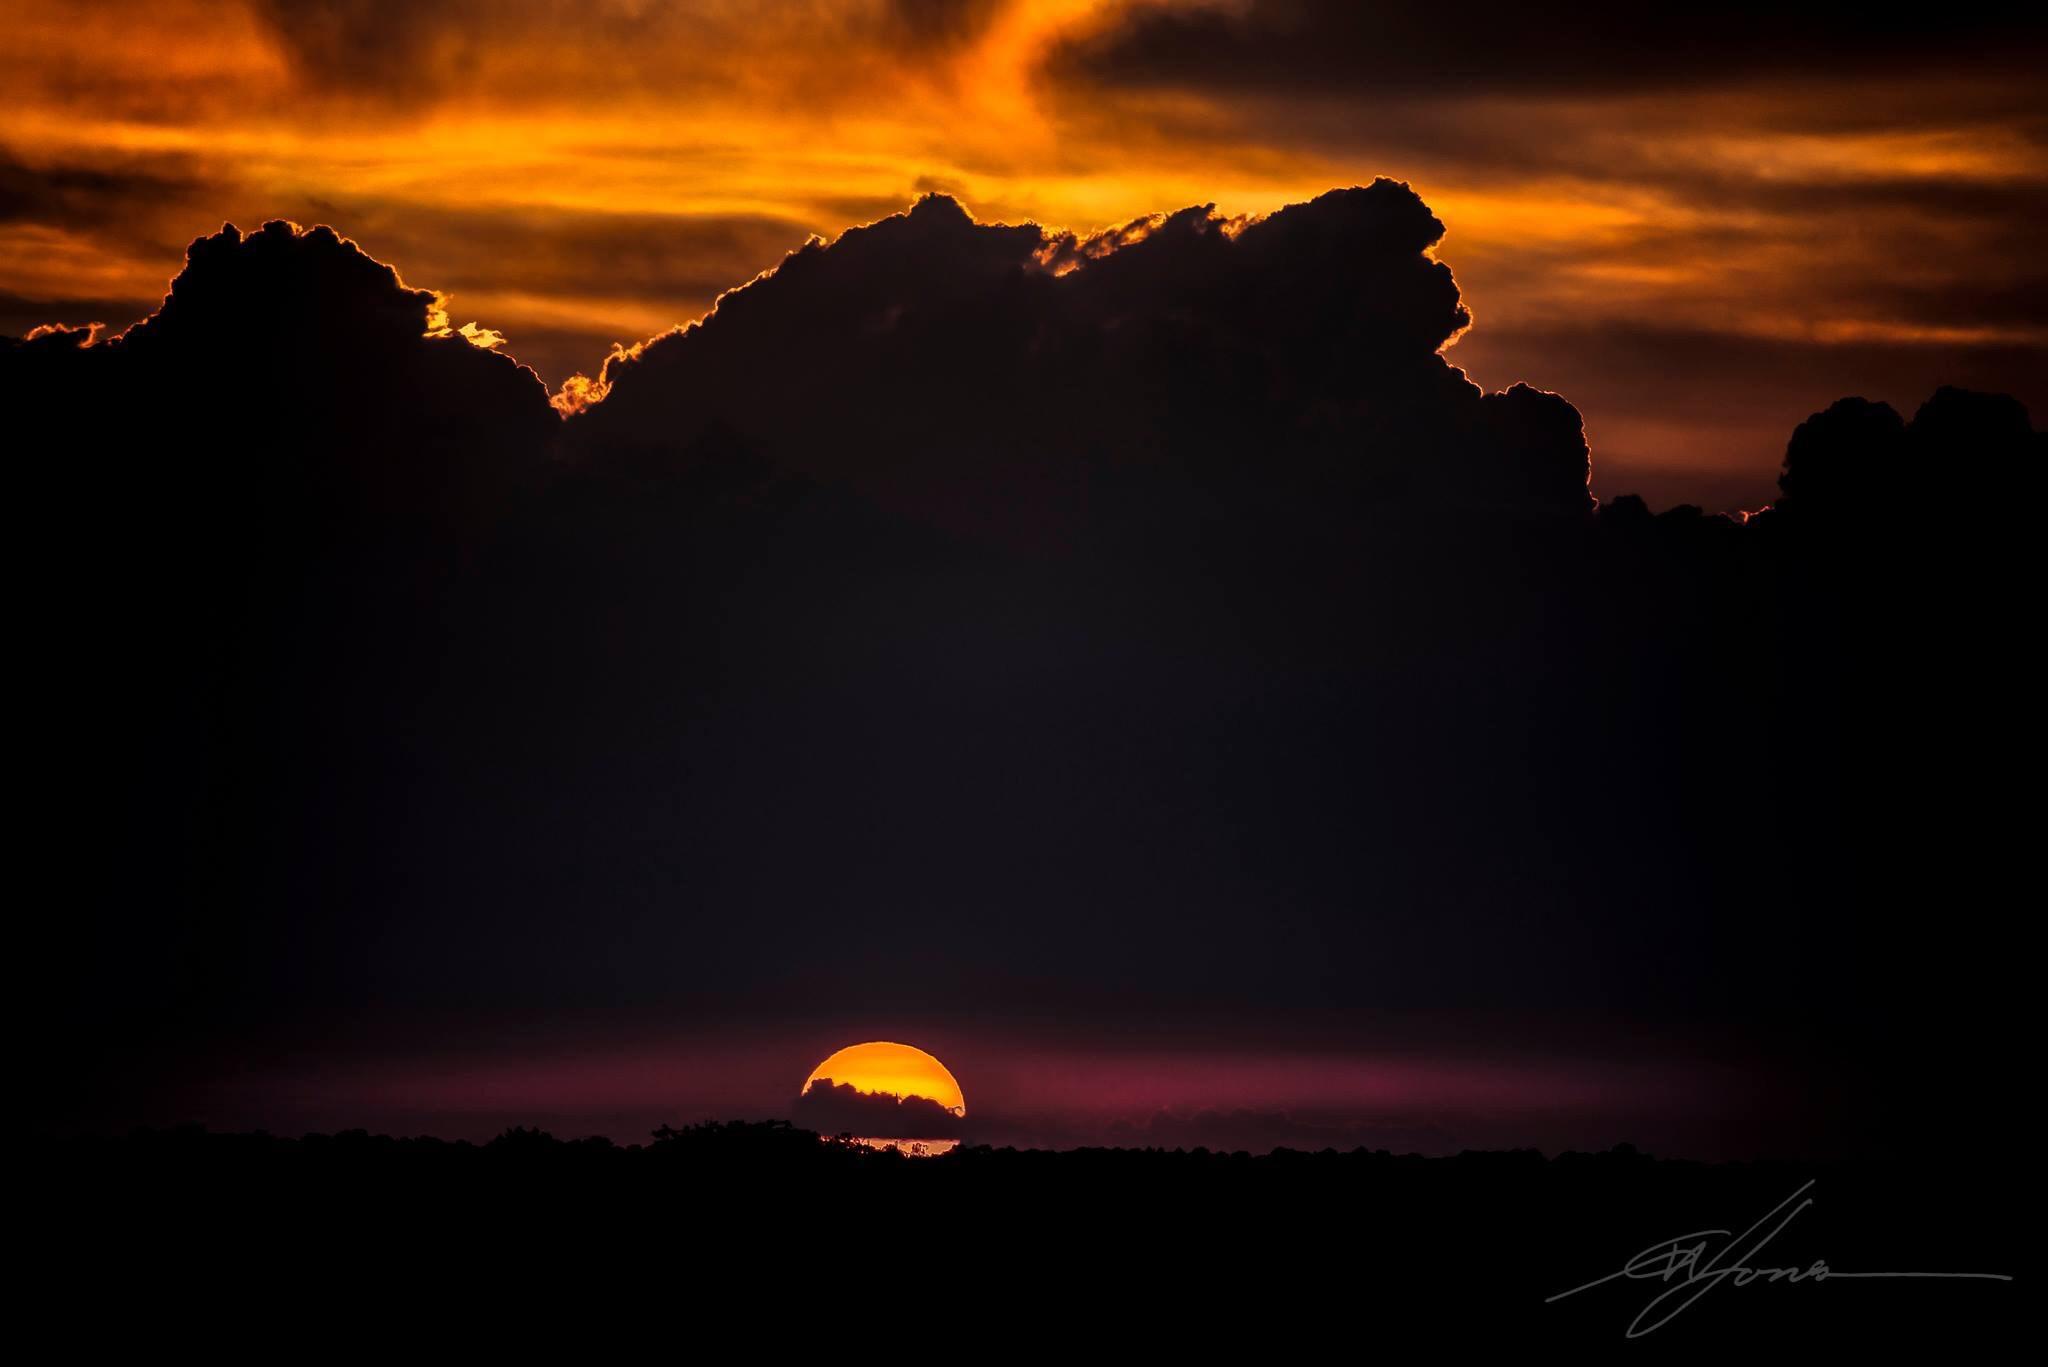 The Heavens Proclaim - 4 by gwjones317